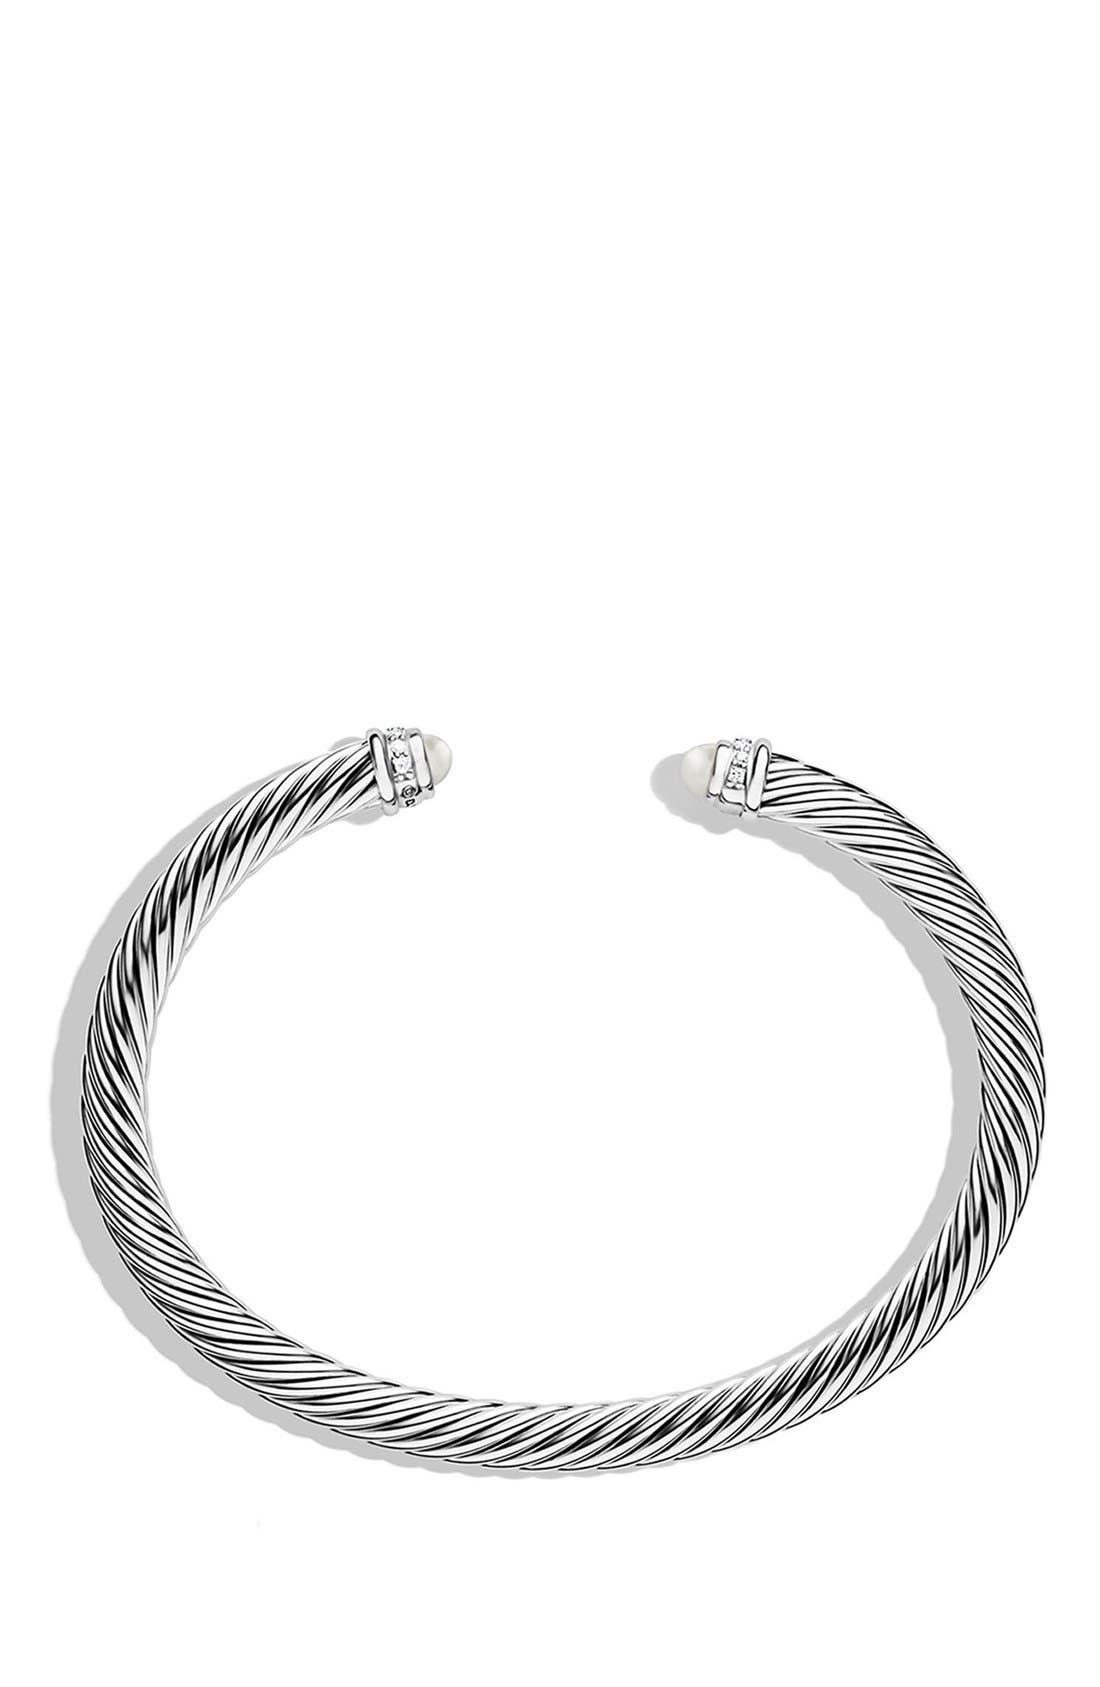 DAVID YURMAN, Cable Classics Bracelet with Semiprecious Stones & Diamonds, 5mm, Alternate thumbnail 3, color, PEARL